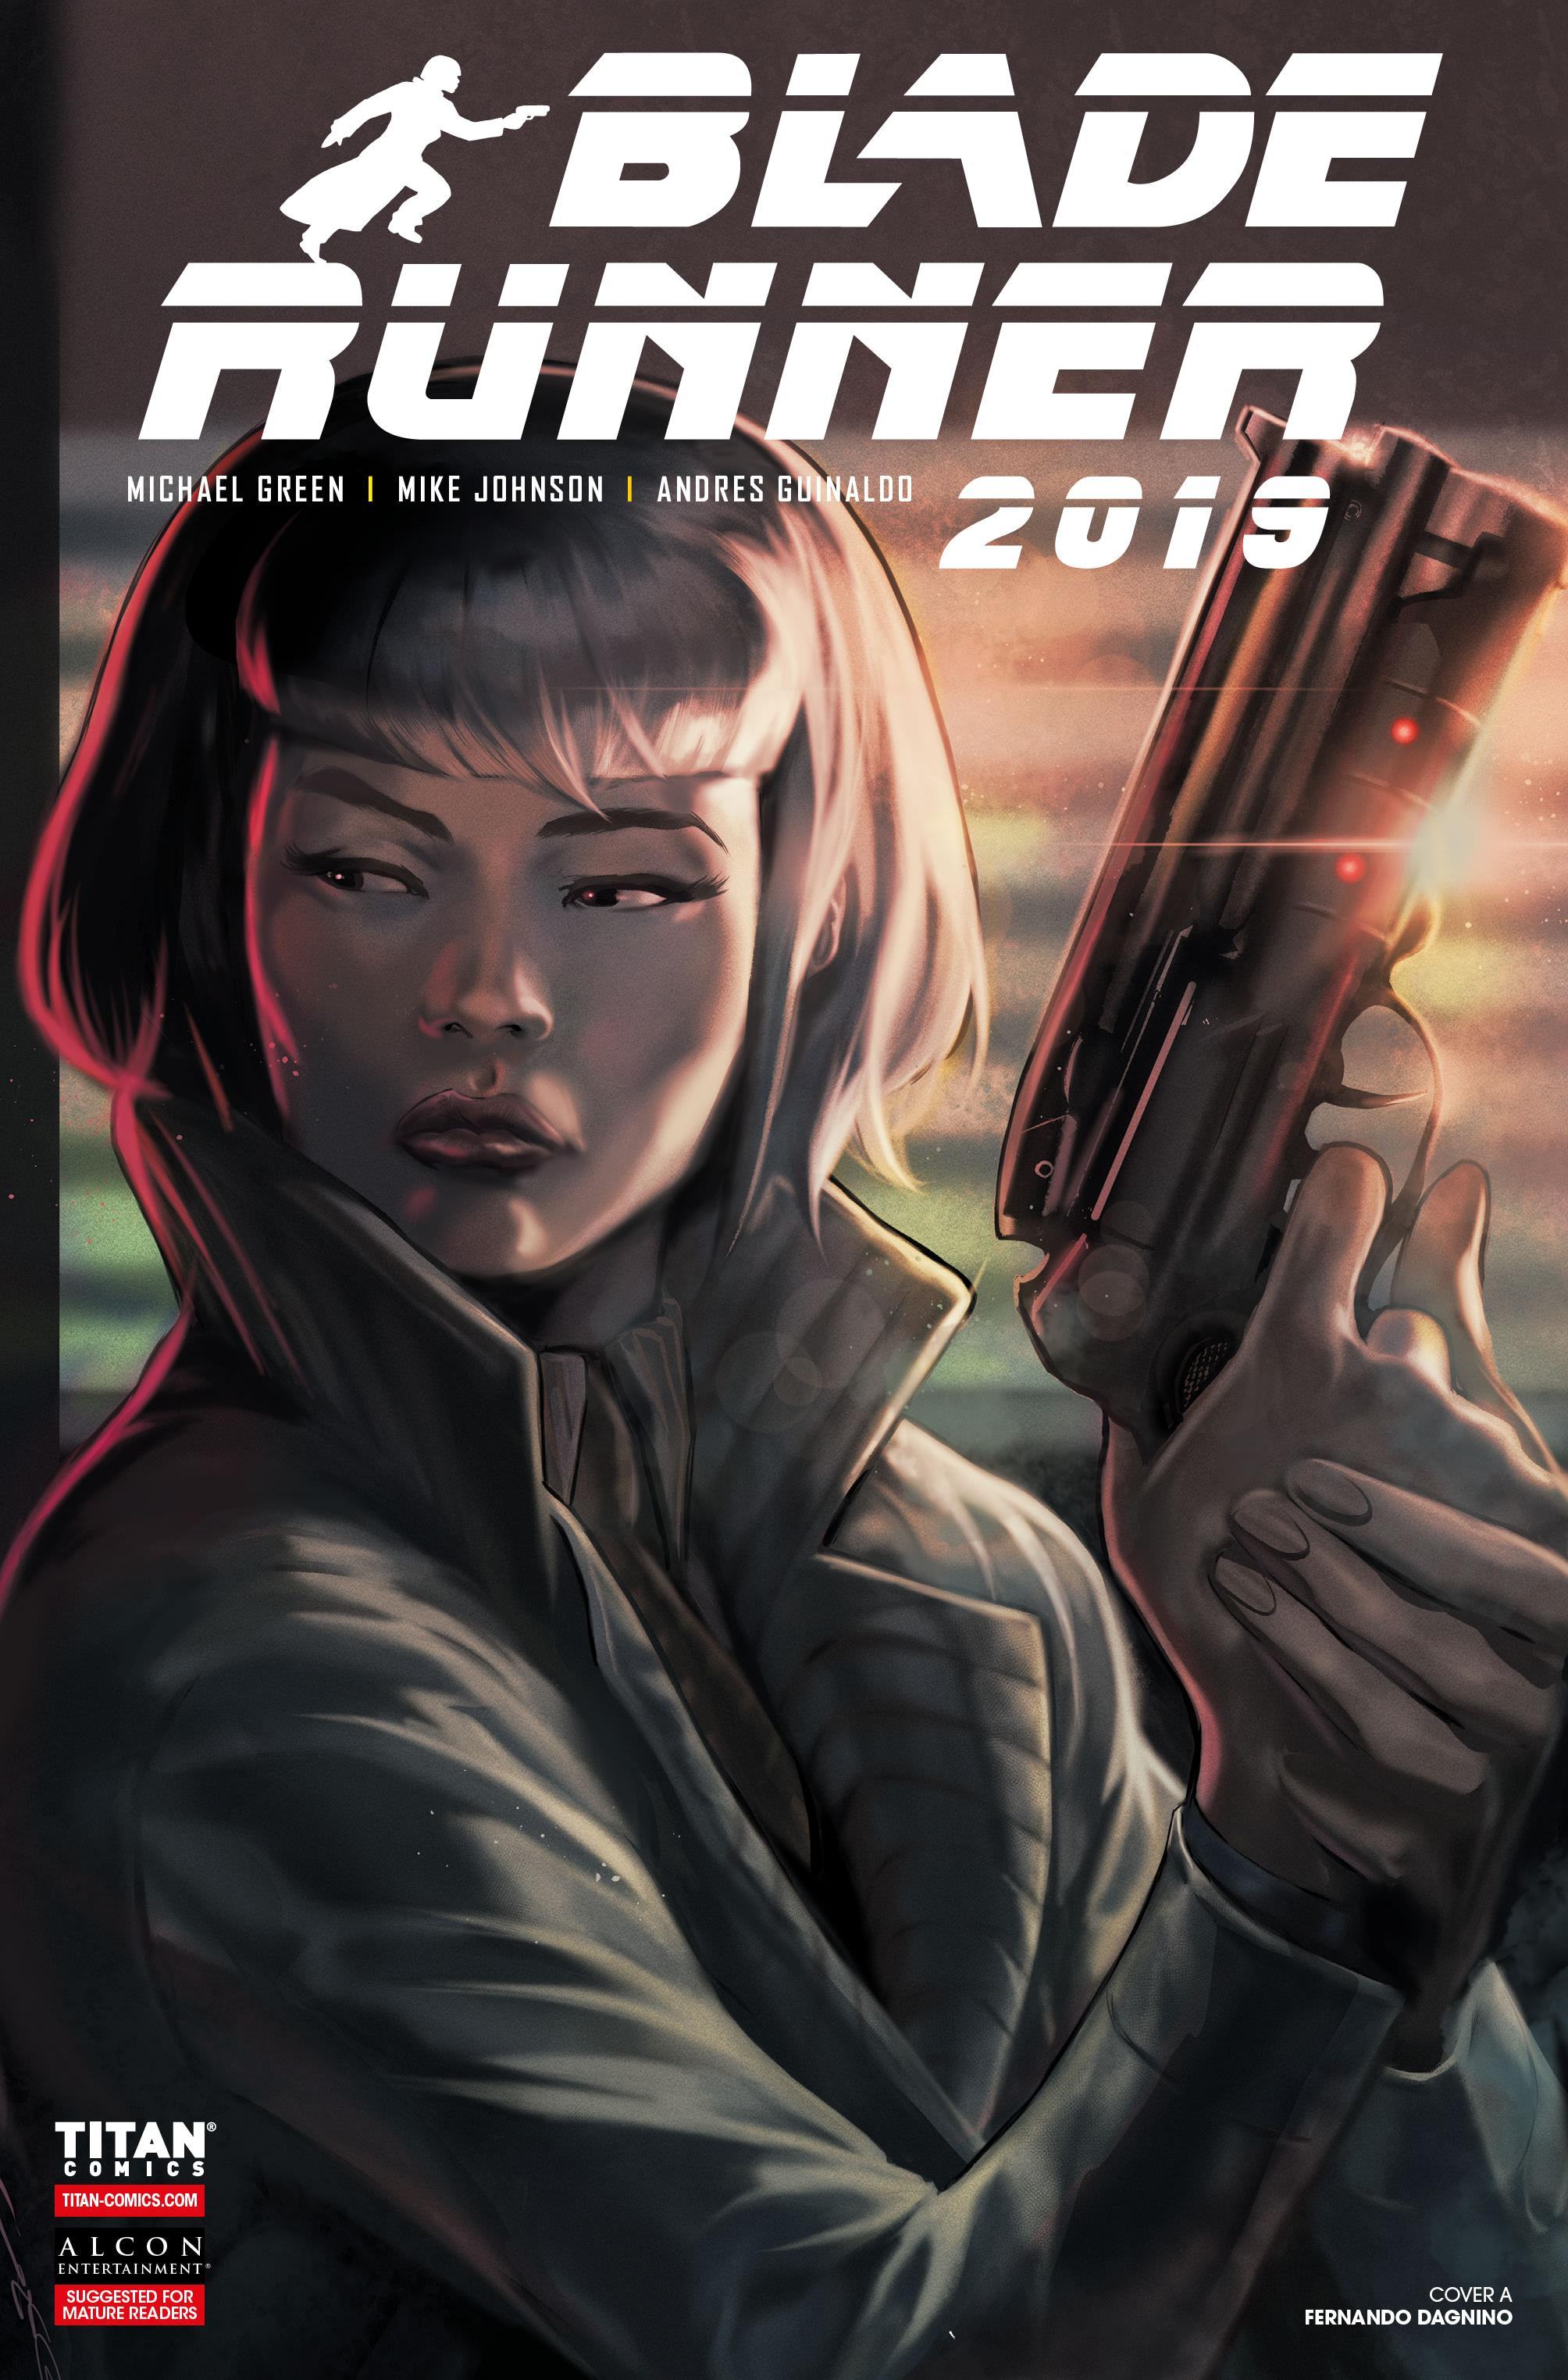 Blade Runner 2019 012 (2020) (3 covers) (digital) (Son of Ultron-Empire